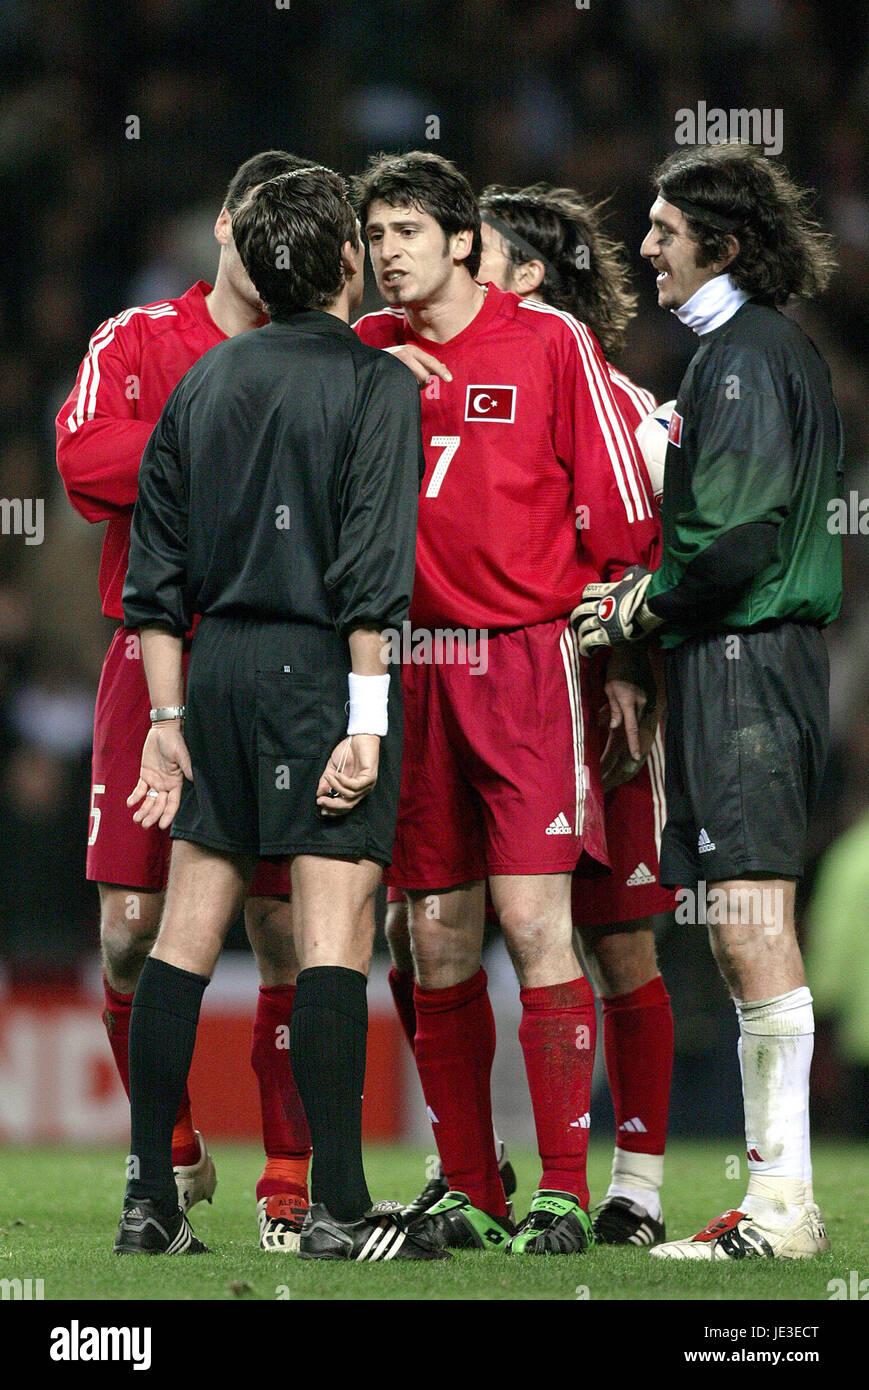 TURKISH PLAYERS PLEAD WITH REF ENGLAND V TURKEY THE STADIUM OF LIGHT SUNDERLAND 02 April 2003 - Stock Image